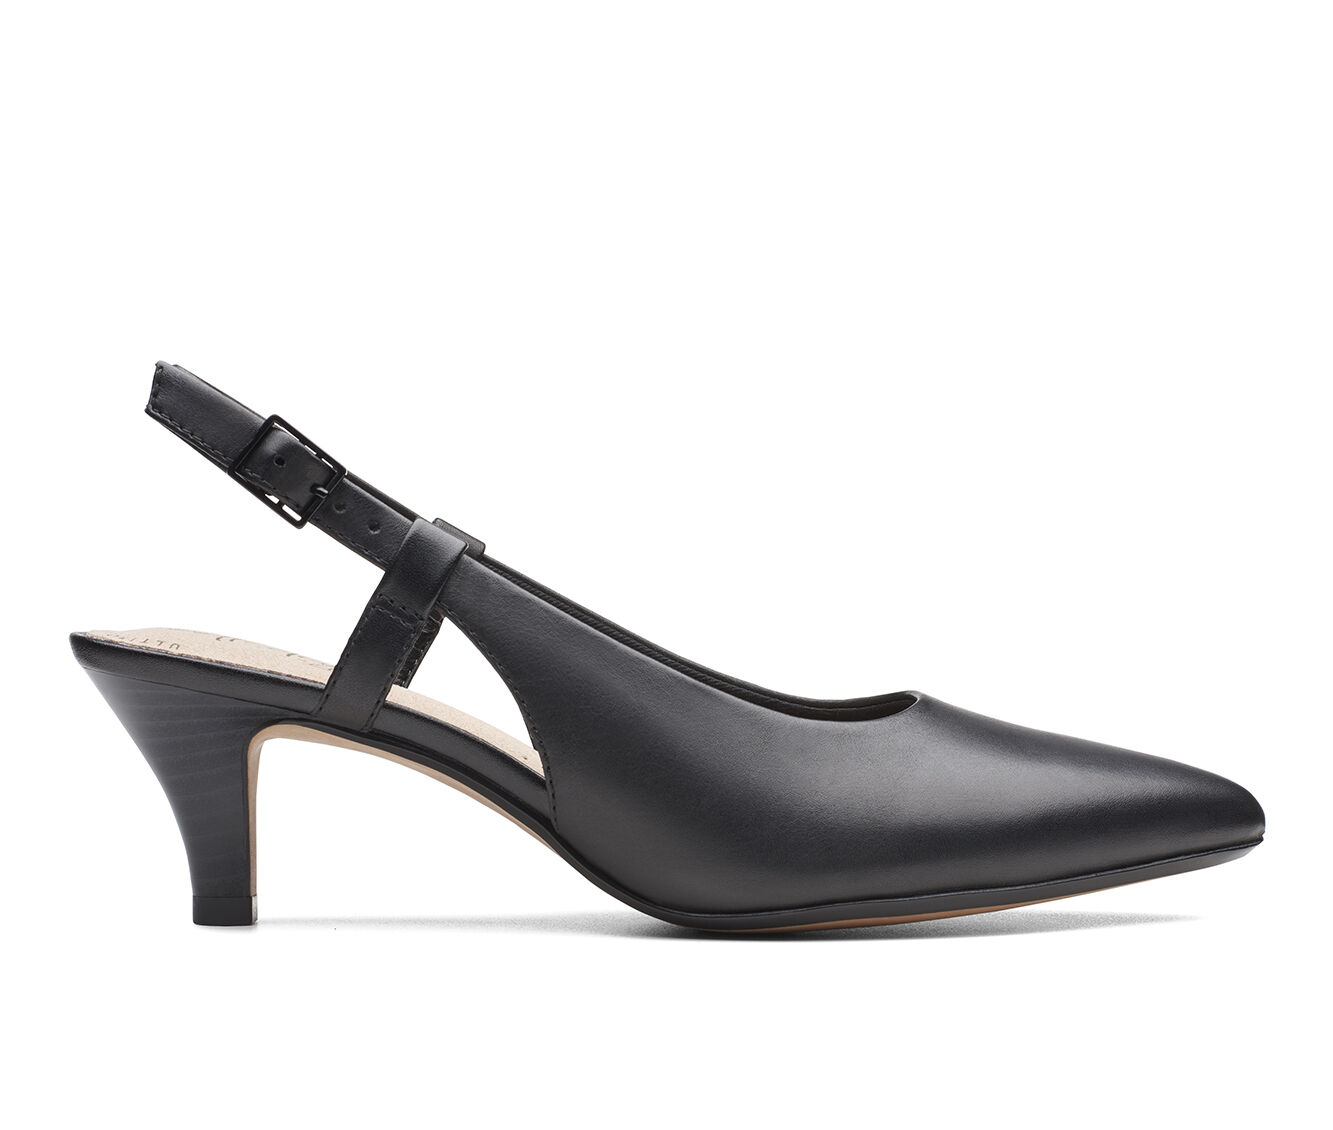 Women's Clarks Linvale Loop Pumps Black Leather